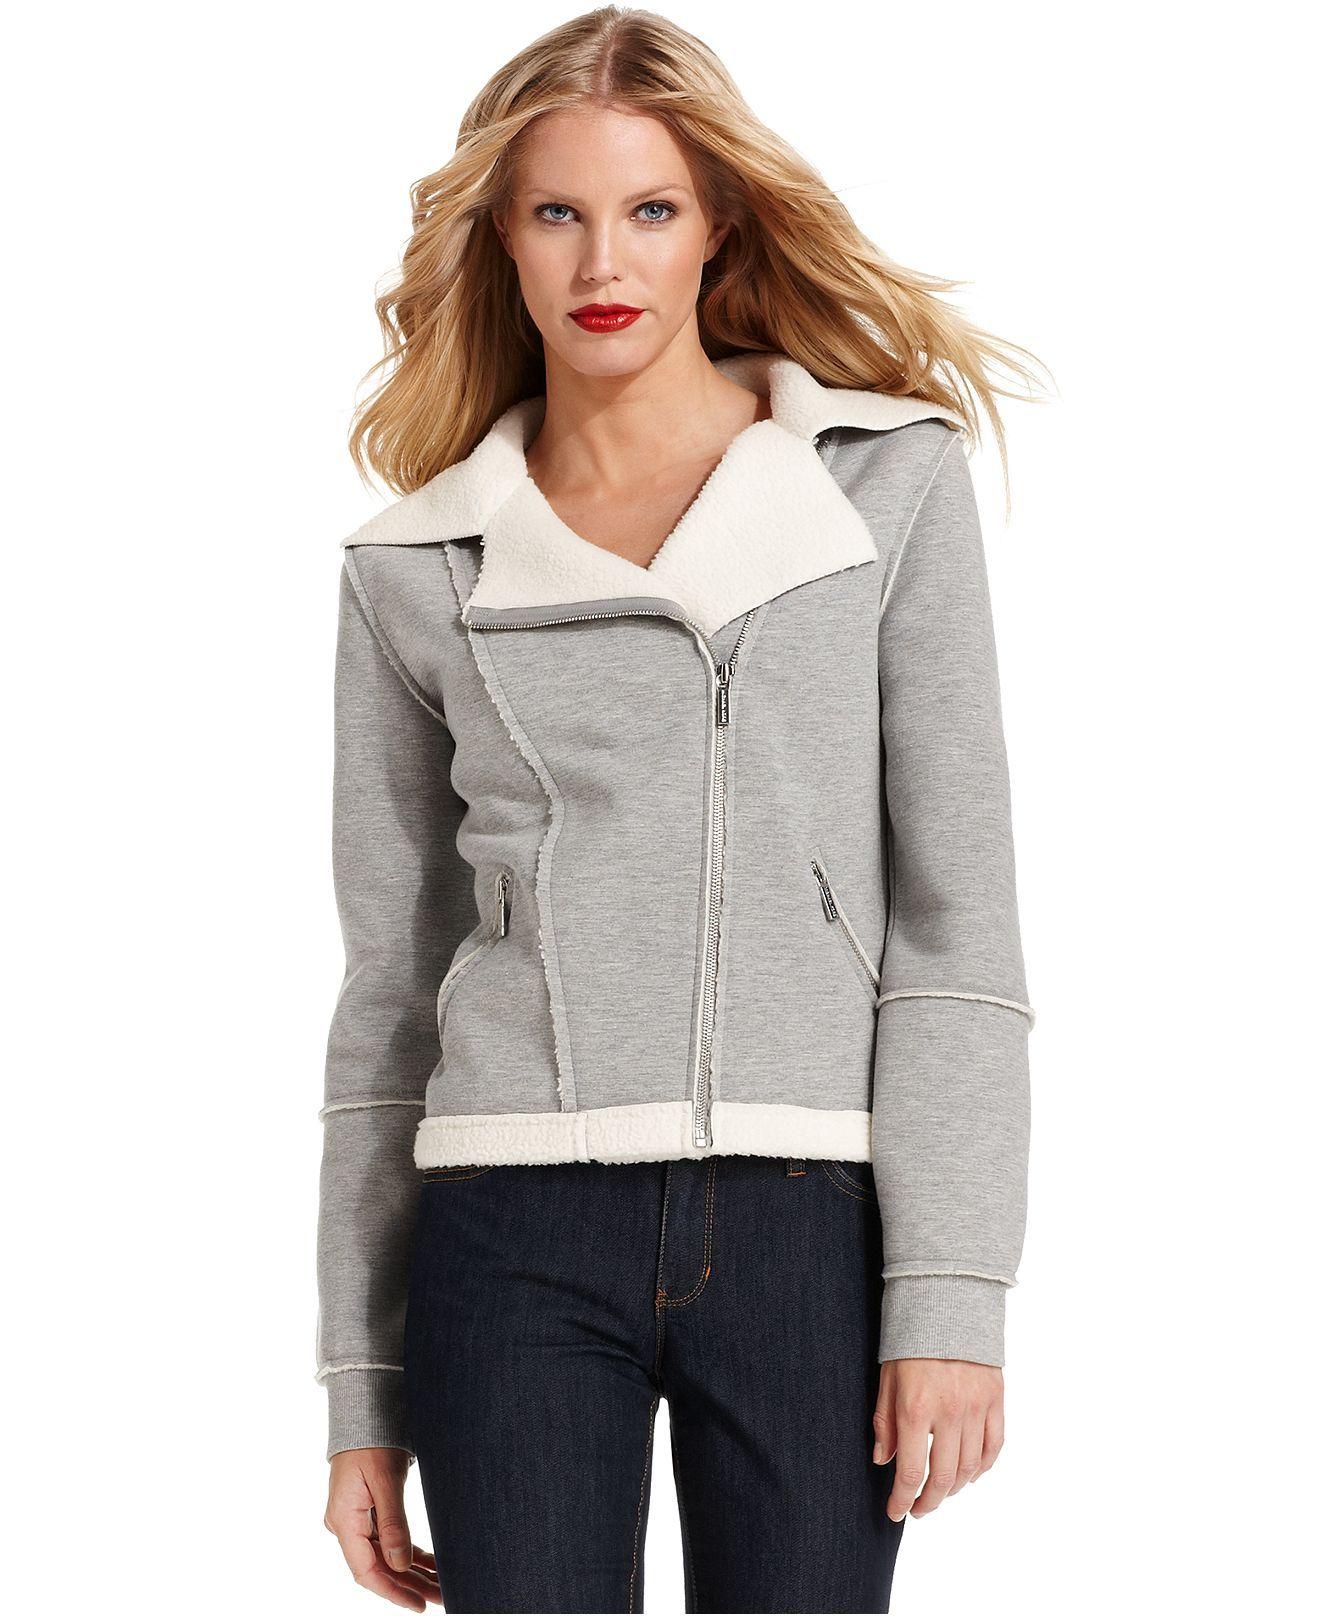 Michael Michael Kors Jacket Seamed Moto Sherpa Womens Jackets Blazers Macy S Blazer Jackets For Women Michael Kors Jackets Jackets [ 1616 x 1320 Pixel ]